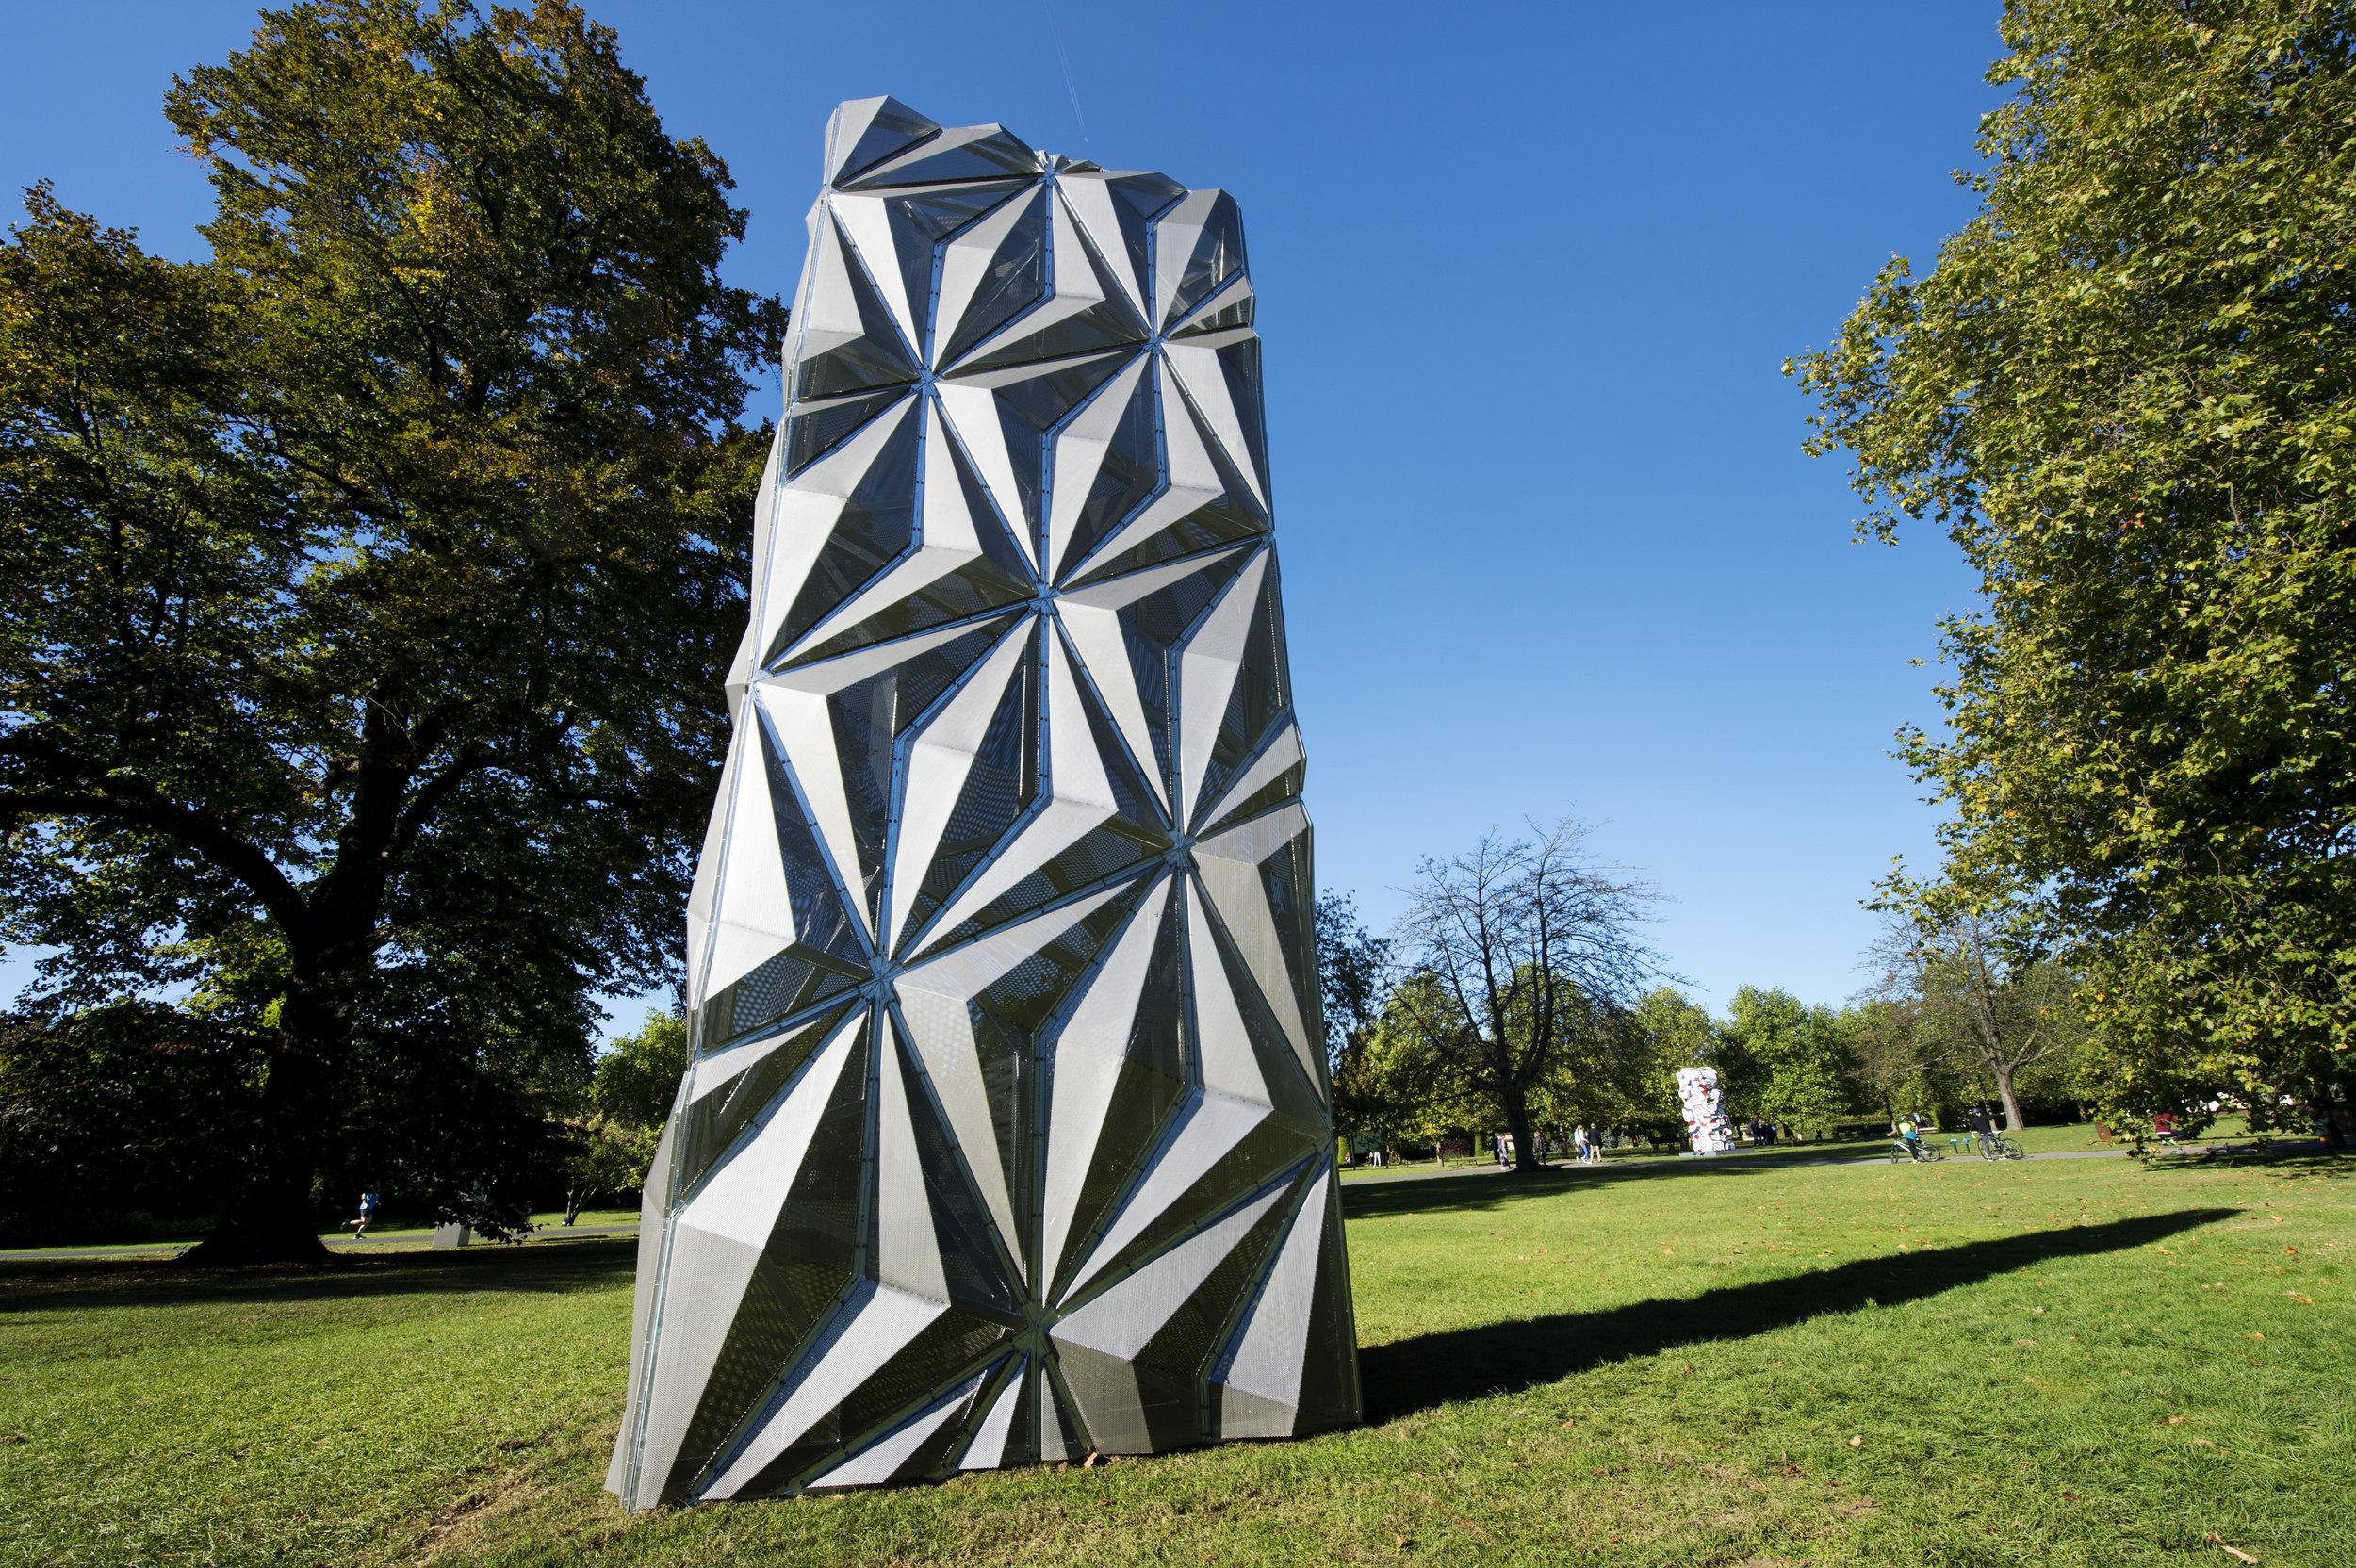 Conrad Shawcross, 'Monolith (Optic)'